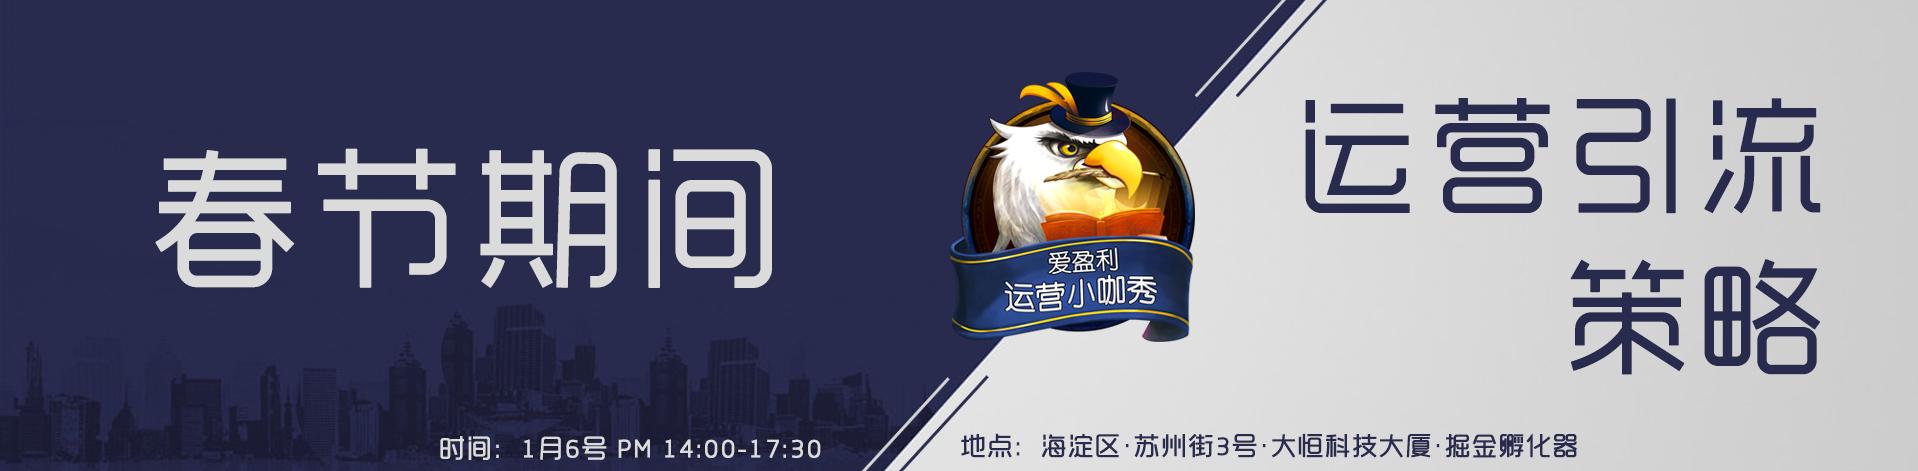 App运营干货系列沙龙之春节引流